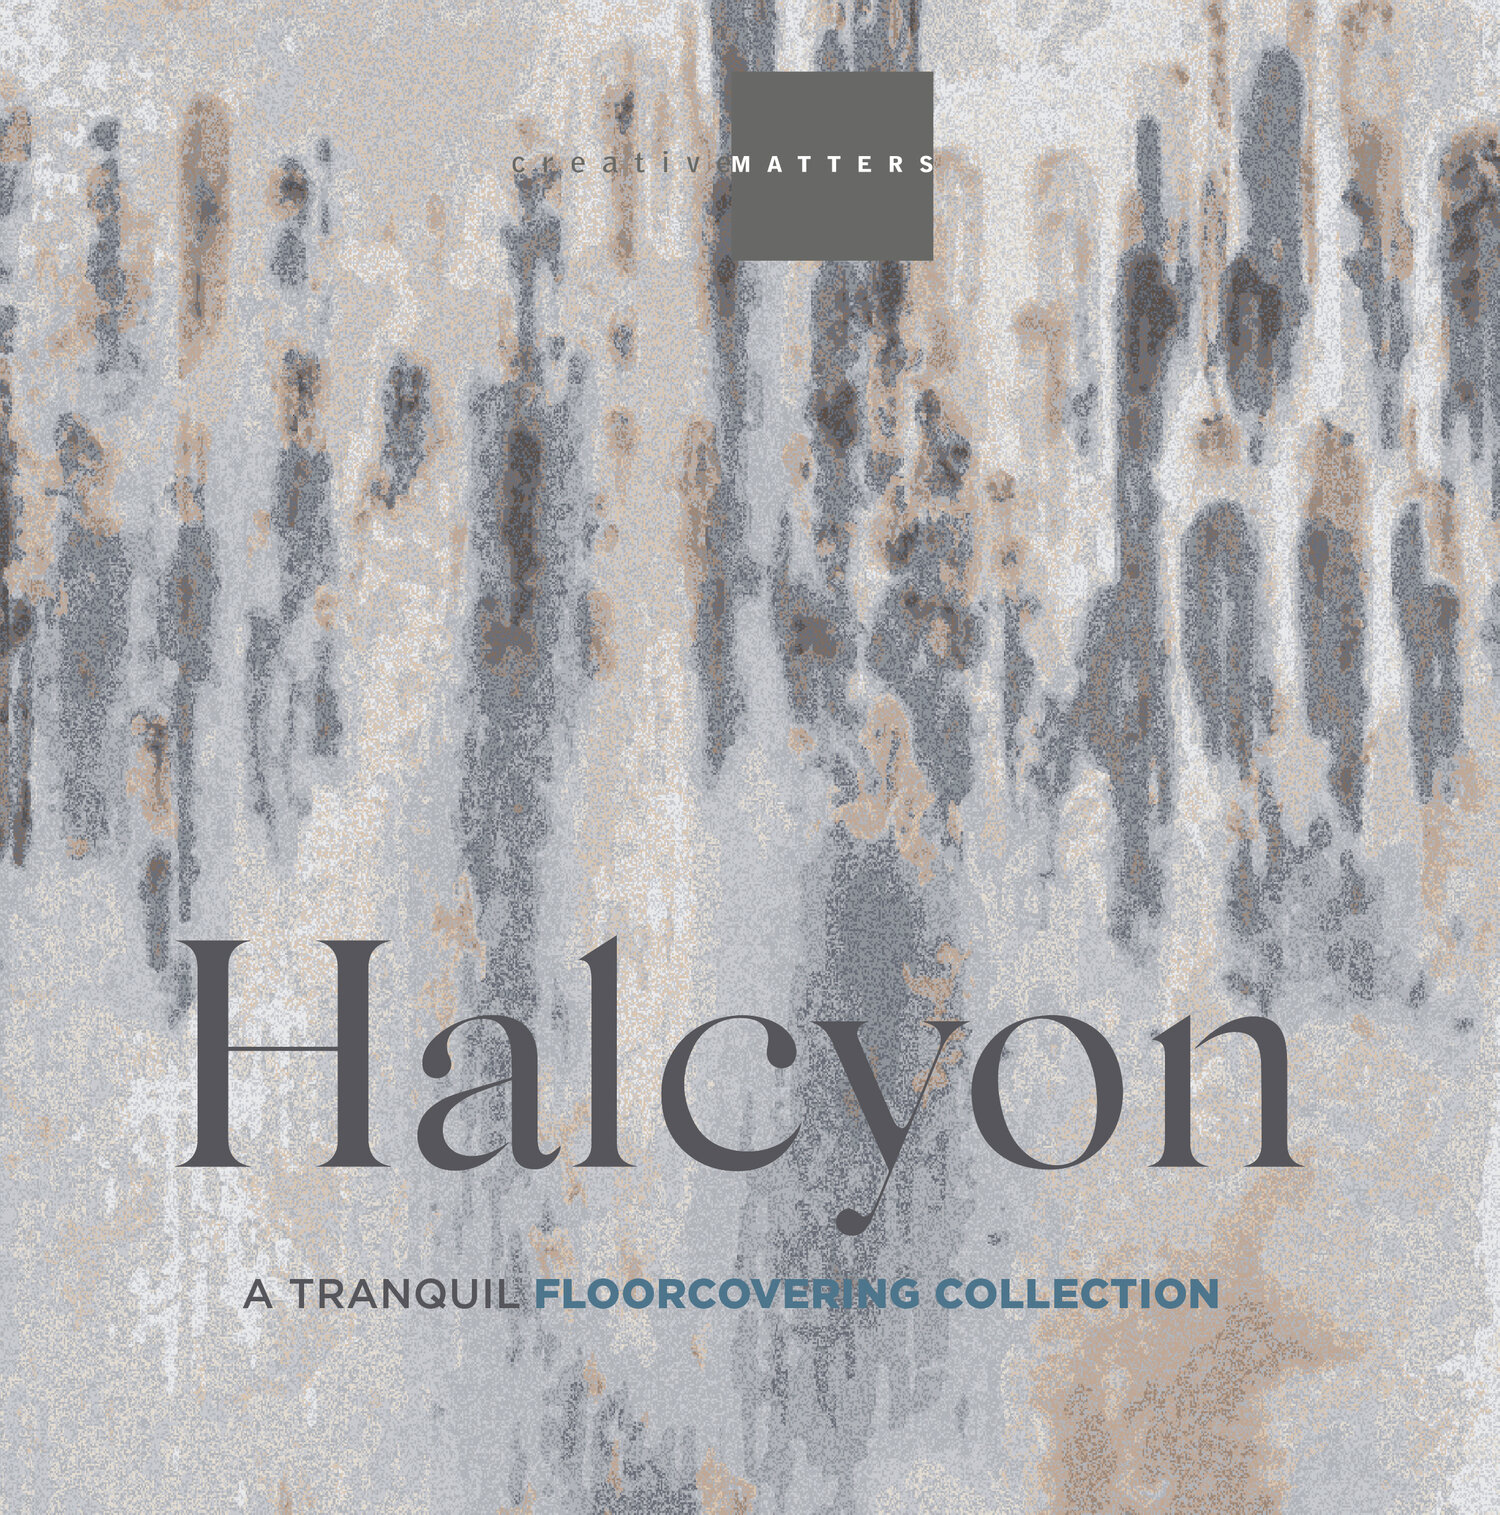 Halcyon_Cover.jpg